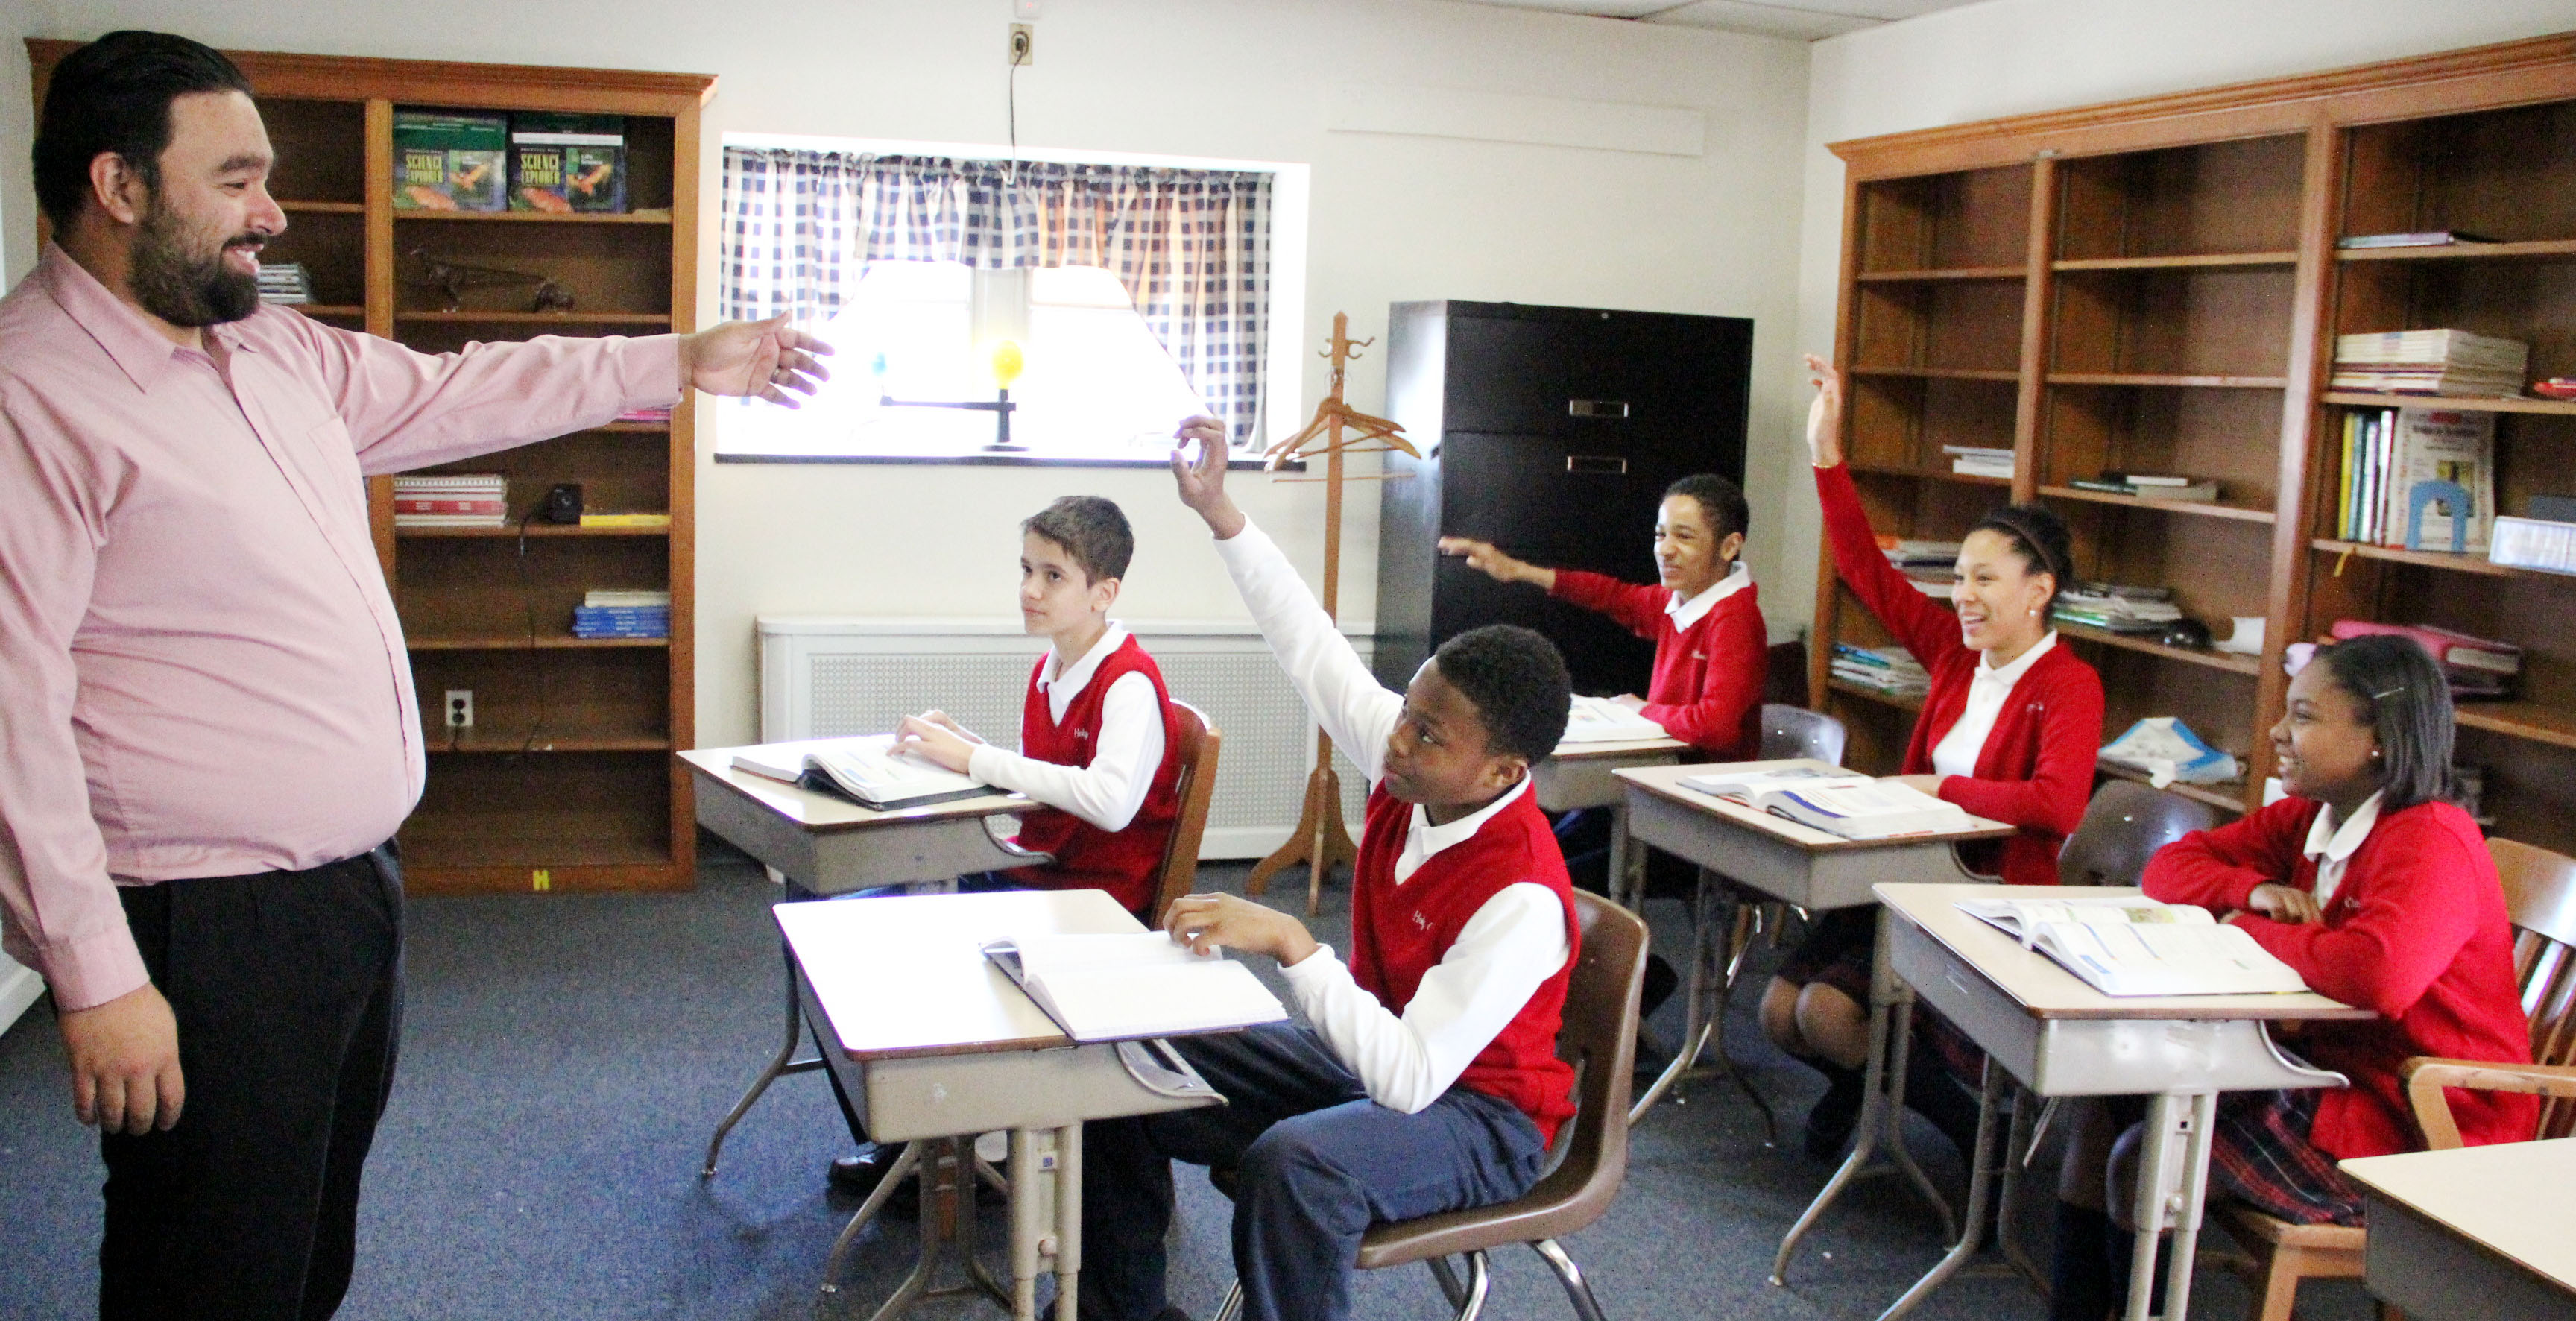 Charles Arroyave (left) teaches Sophia Program students Christopher Peralta, Jarod Thompson, Carl Whittington, Marleen Winterdal, Kaiya Austin April 13 at Holy Cross School in Philadelphia's Mount Airy section. (Sarah Webb)